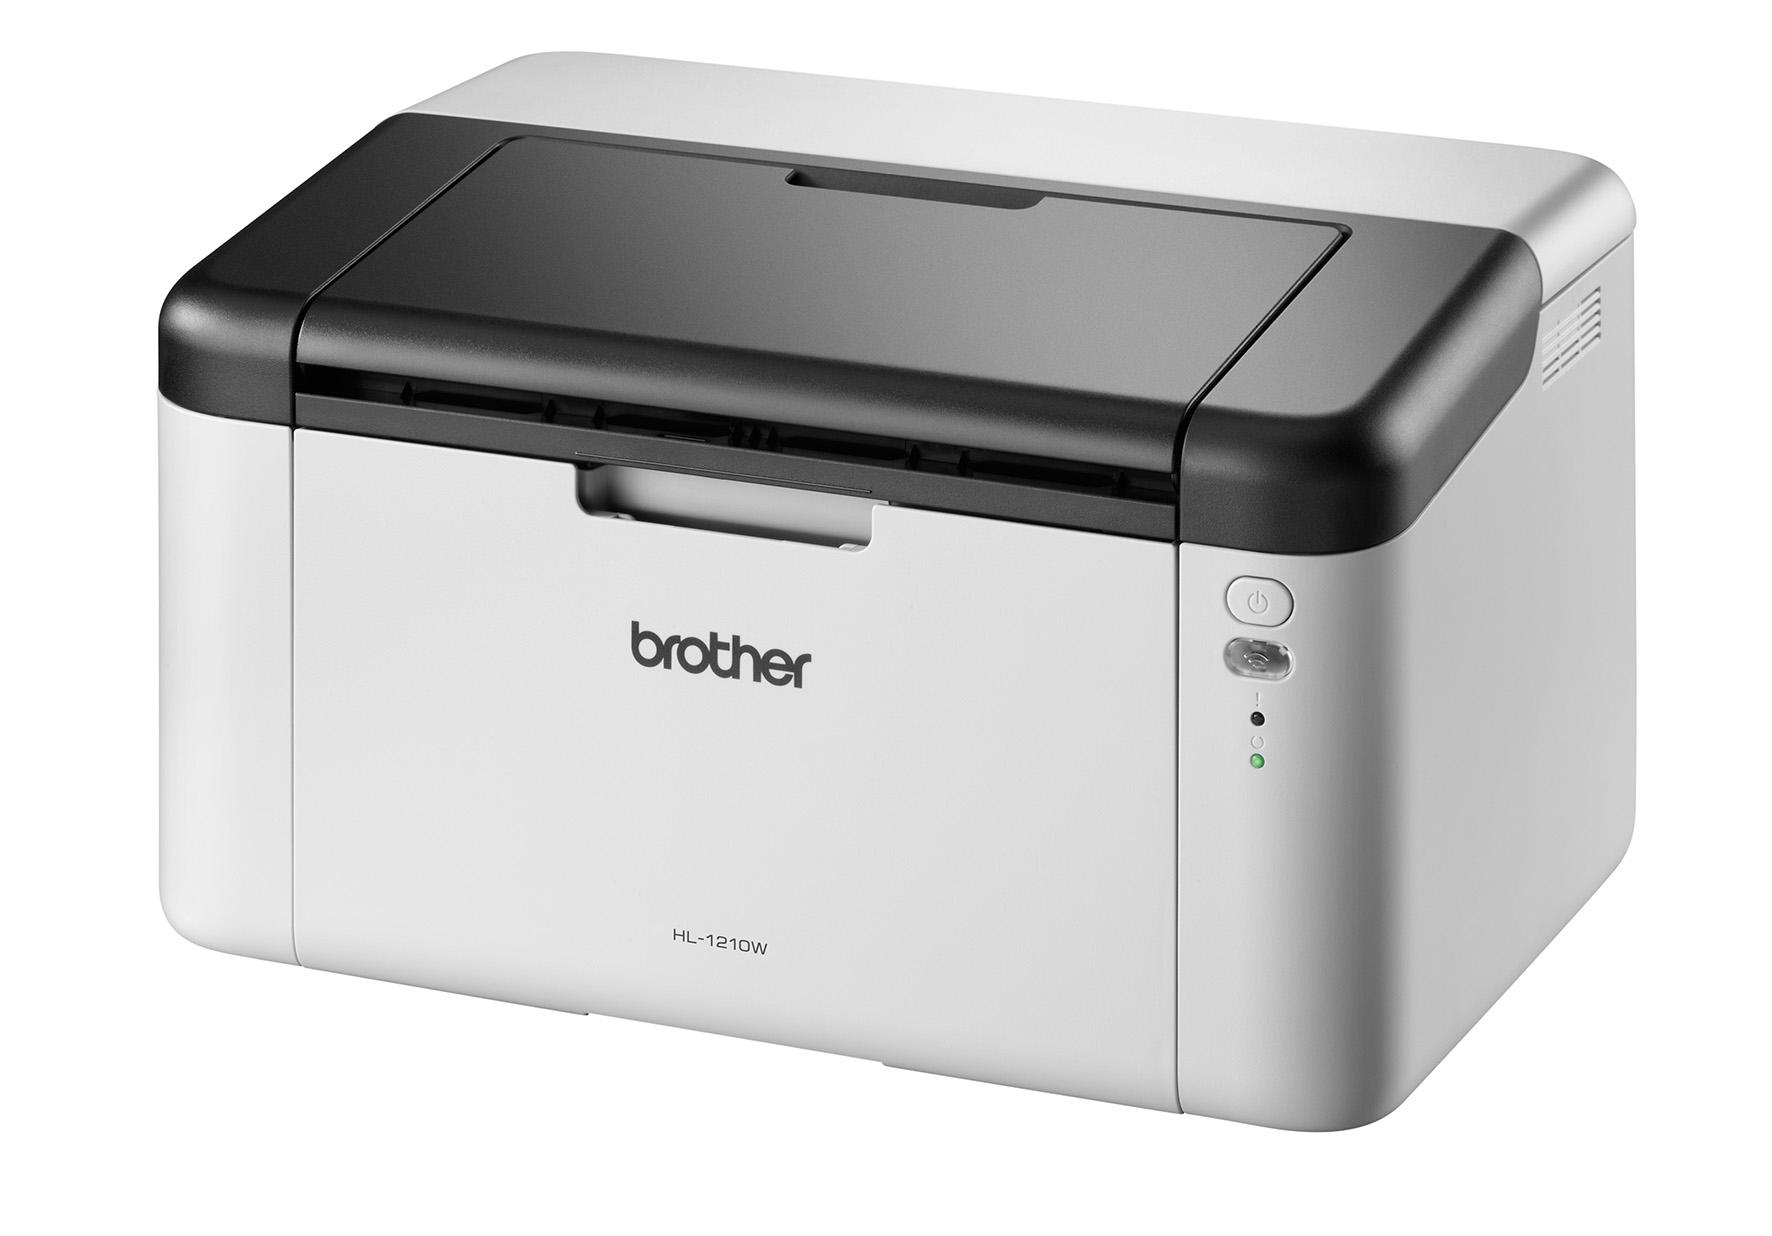 Brother printer HL1210